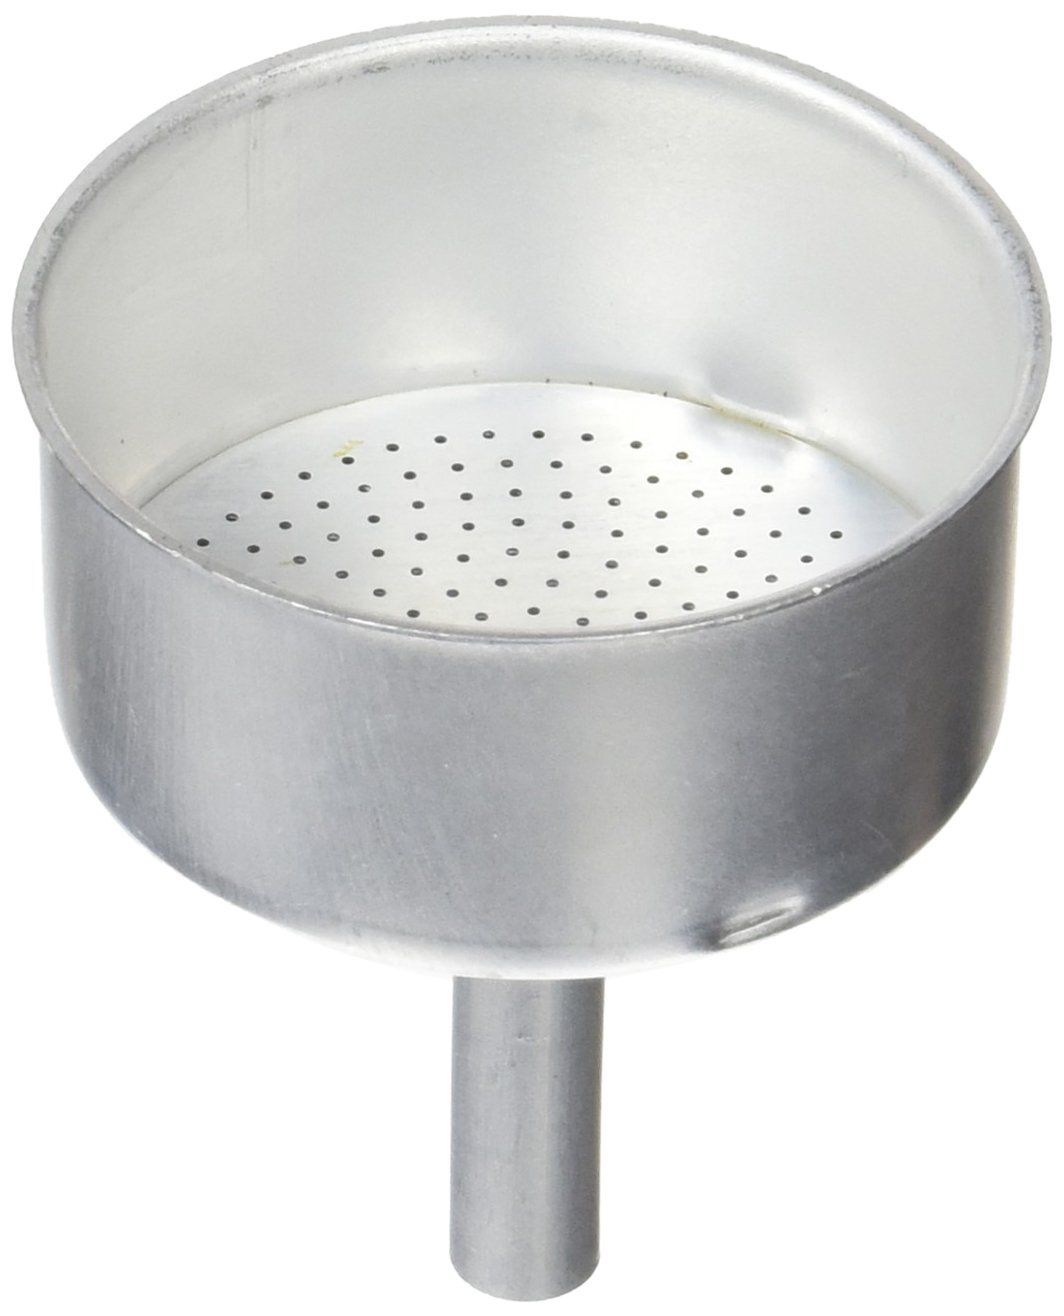 Distribuidora Ersa Filtro con Embudo Cafetera, Aluminio, Gris, 17,6 x 12,7 x 6,8 cm Tecnhogar 01477